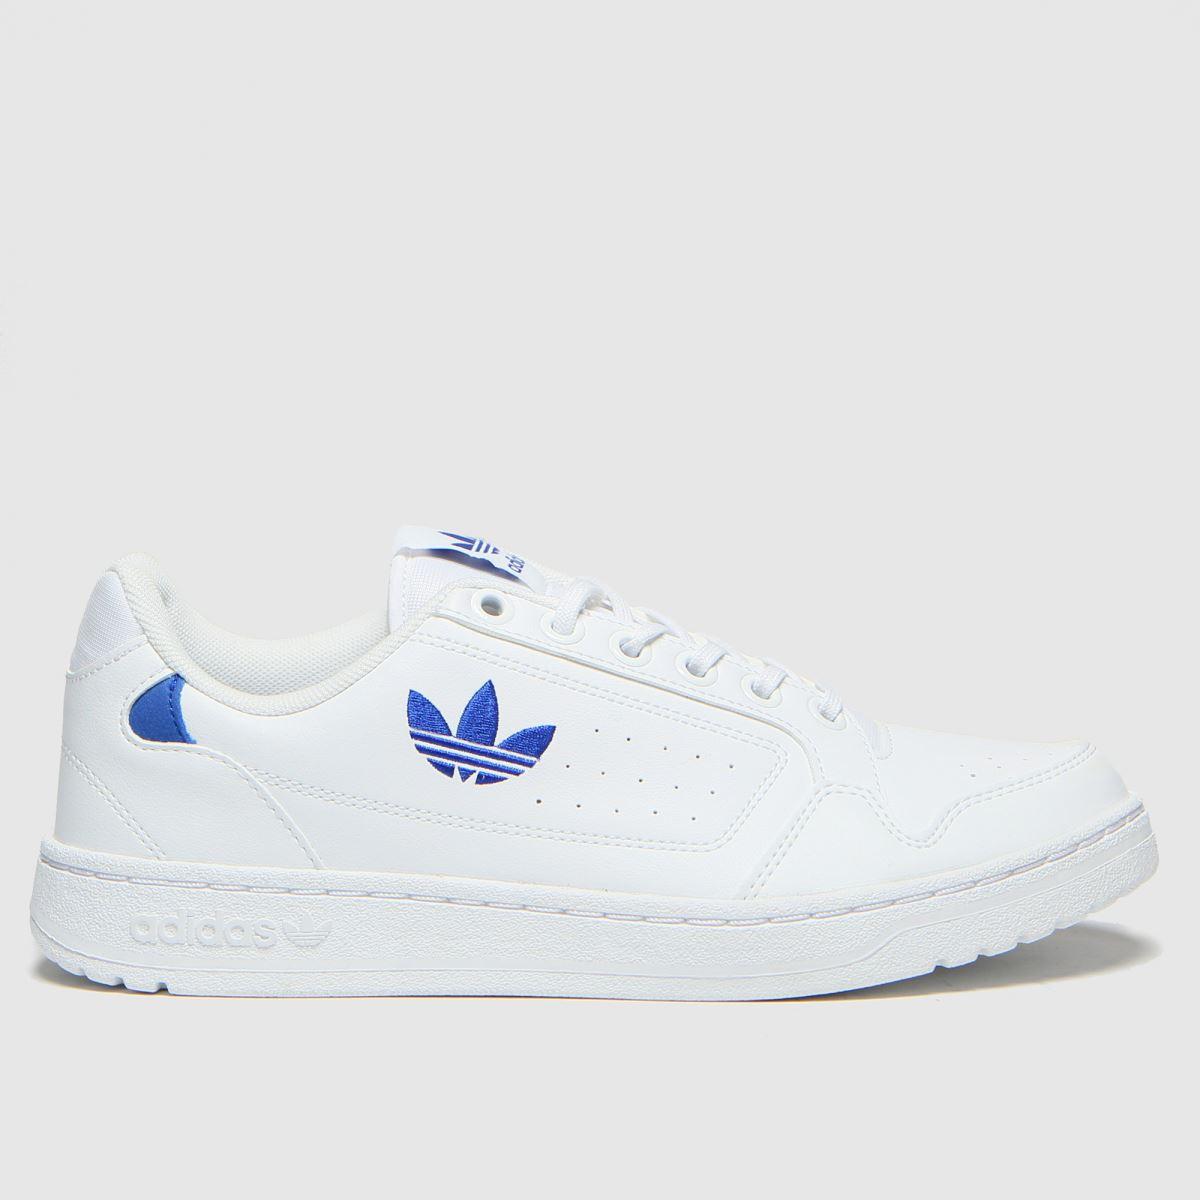 Adidas White Ny 90 Trainers